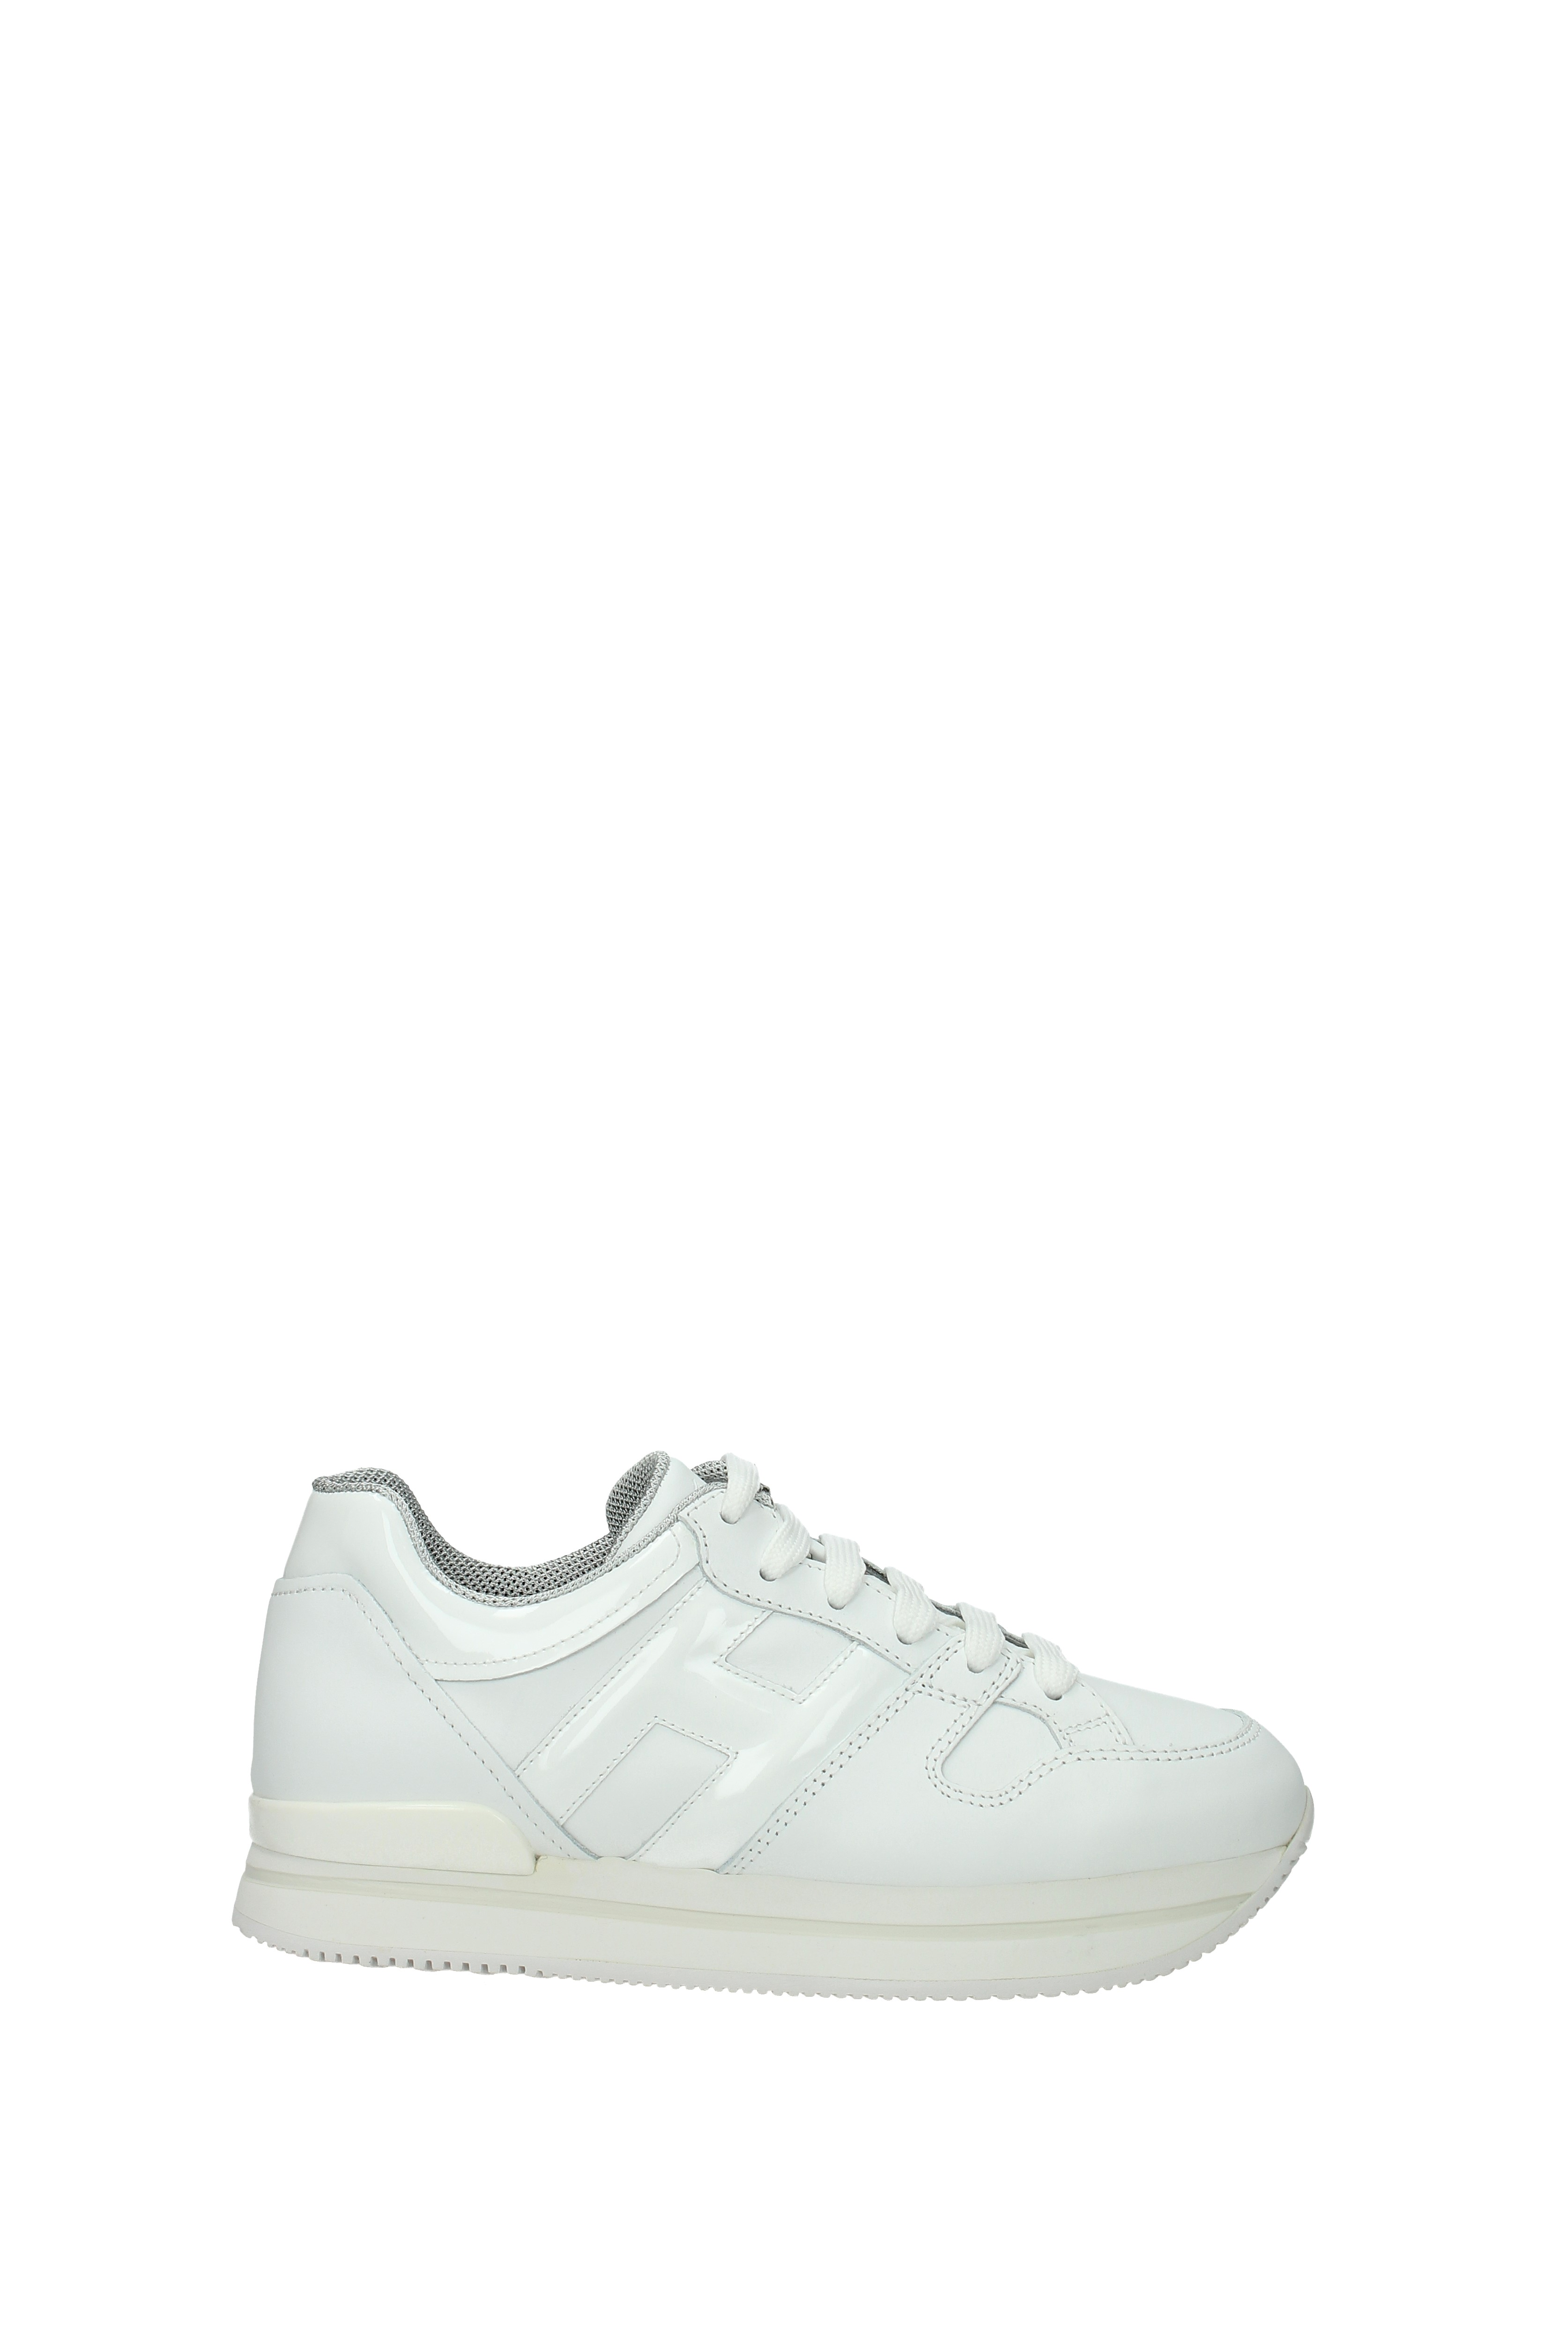 Alta qualit Sneakers Hogan Donna Pelle HXW2220T548I6S vendita